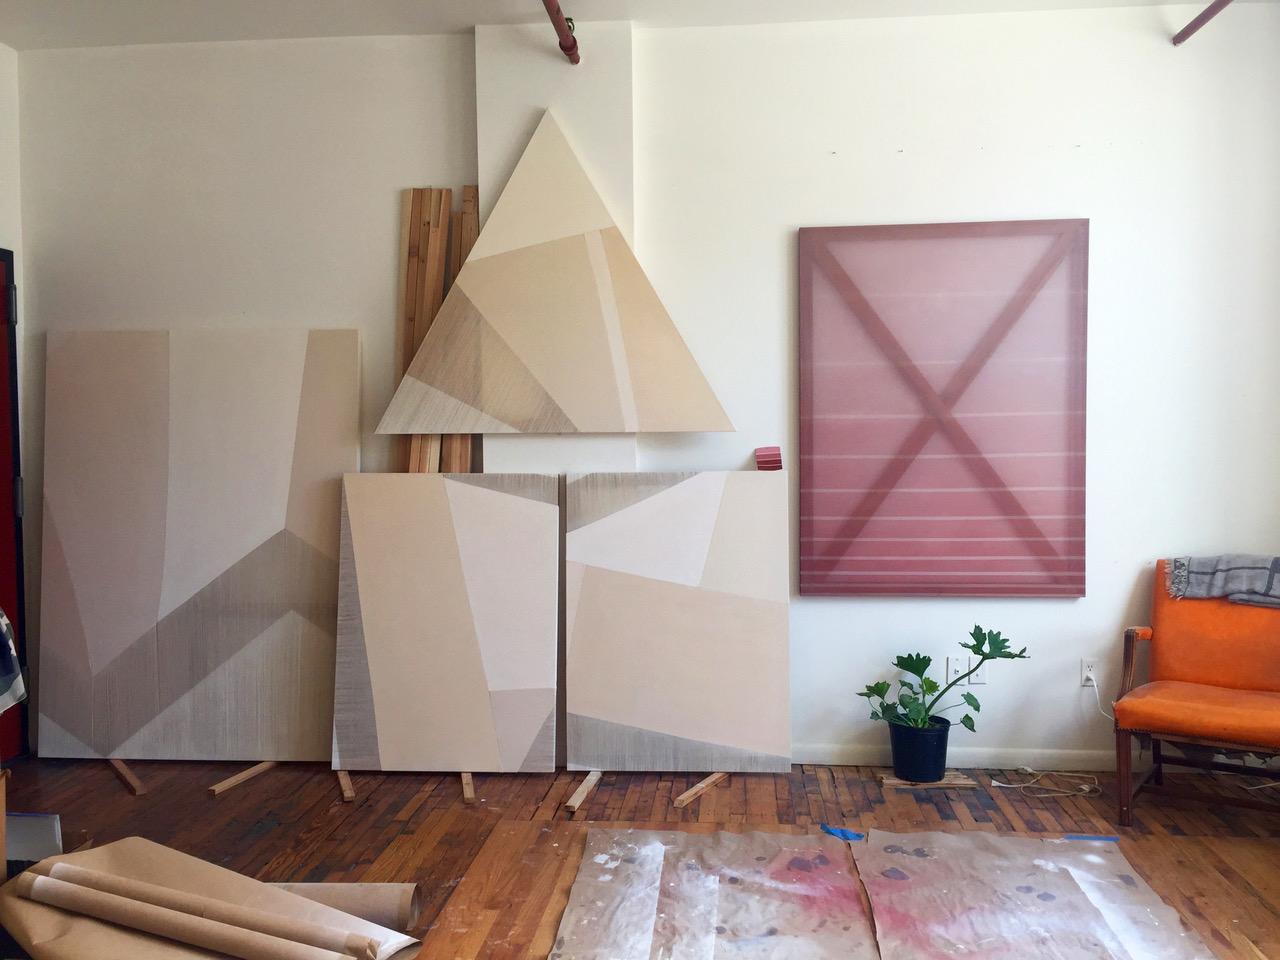 Rebecca Ward's studio